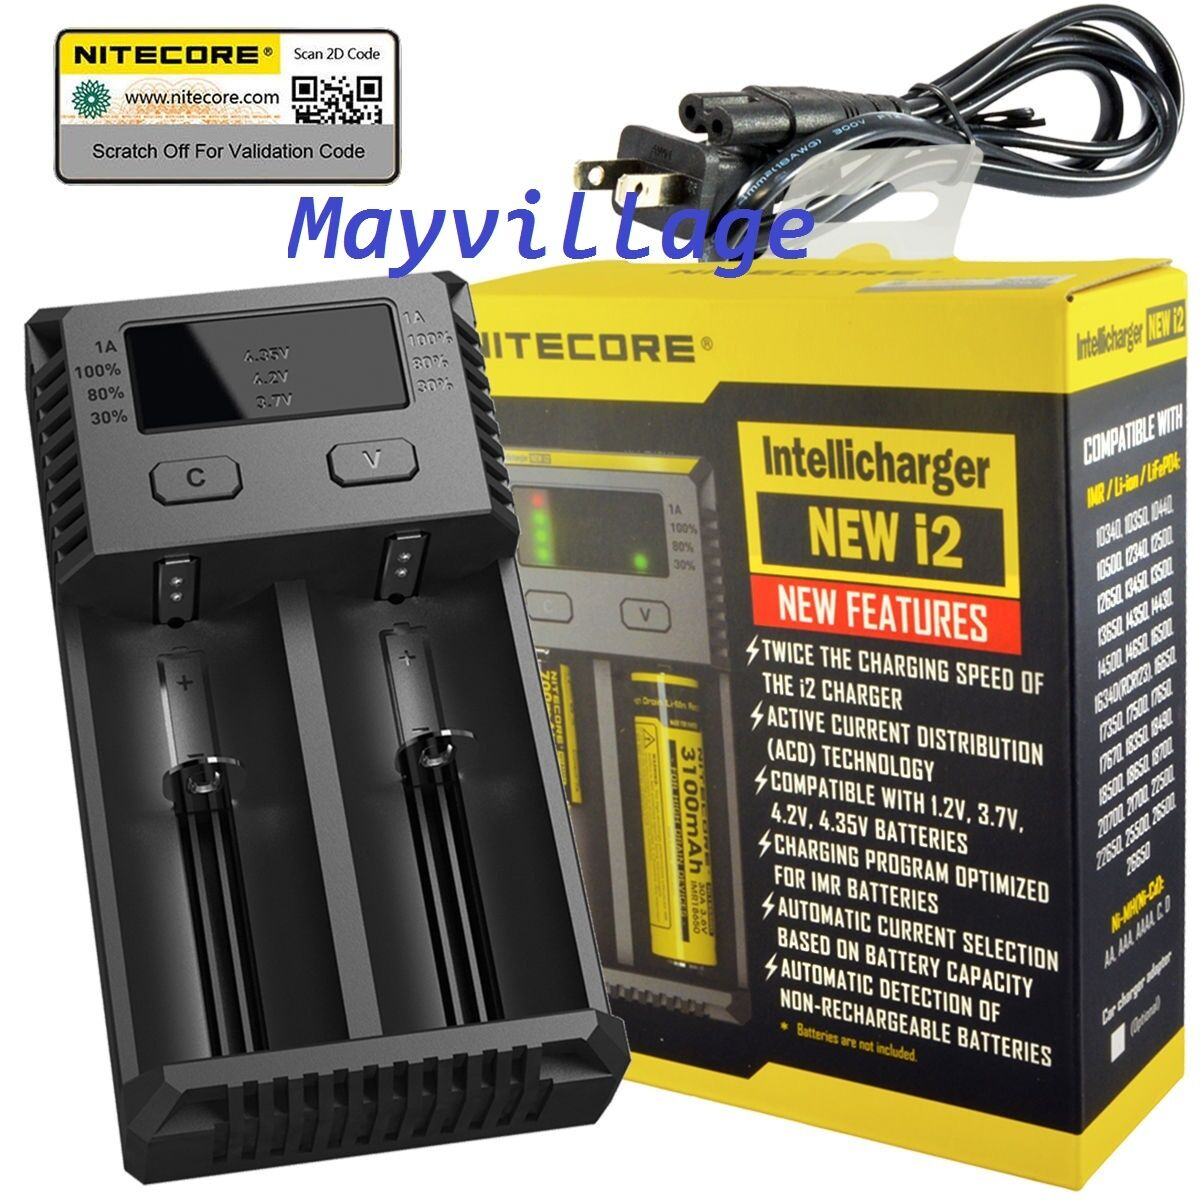 NITECORE i2 Intellicharger Battery Charger For SMOKTech Vape Mods 18650